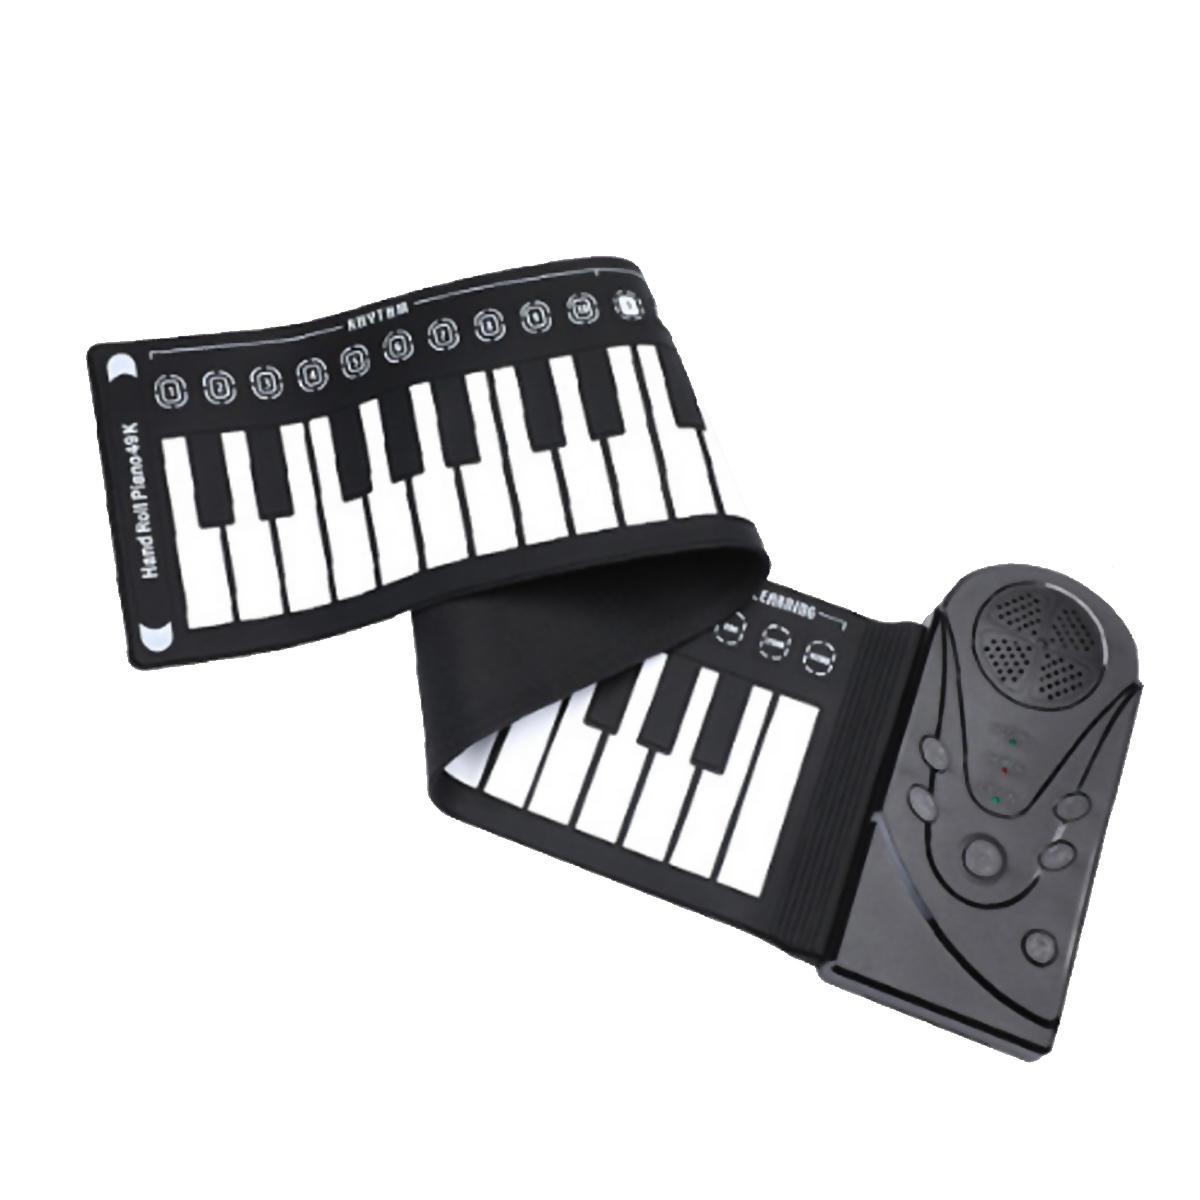 Bàn phím cầm tay 49 phím cầm tay Piano MIDI